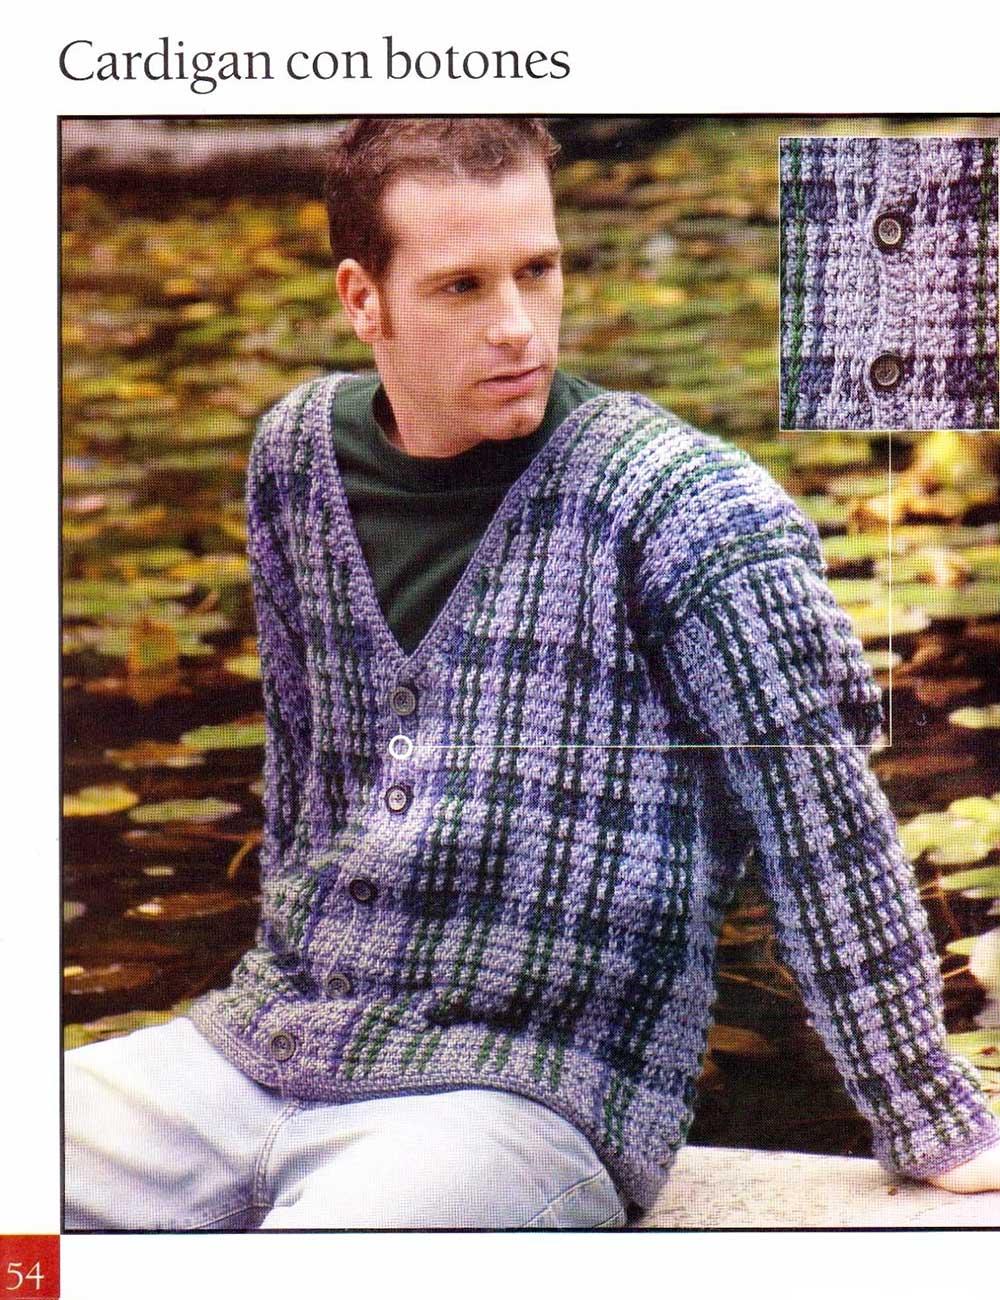 chaqueta hombre crochet, chaqueta ganchillo hombre, patrones crochet